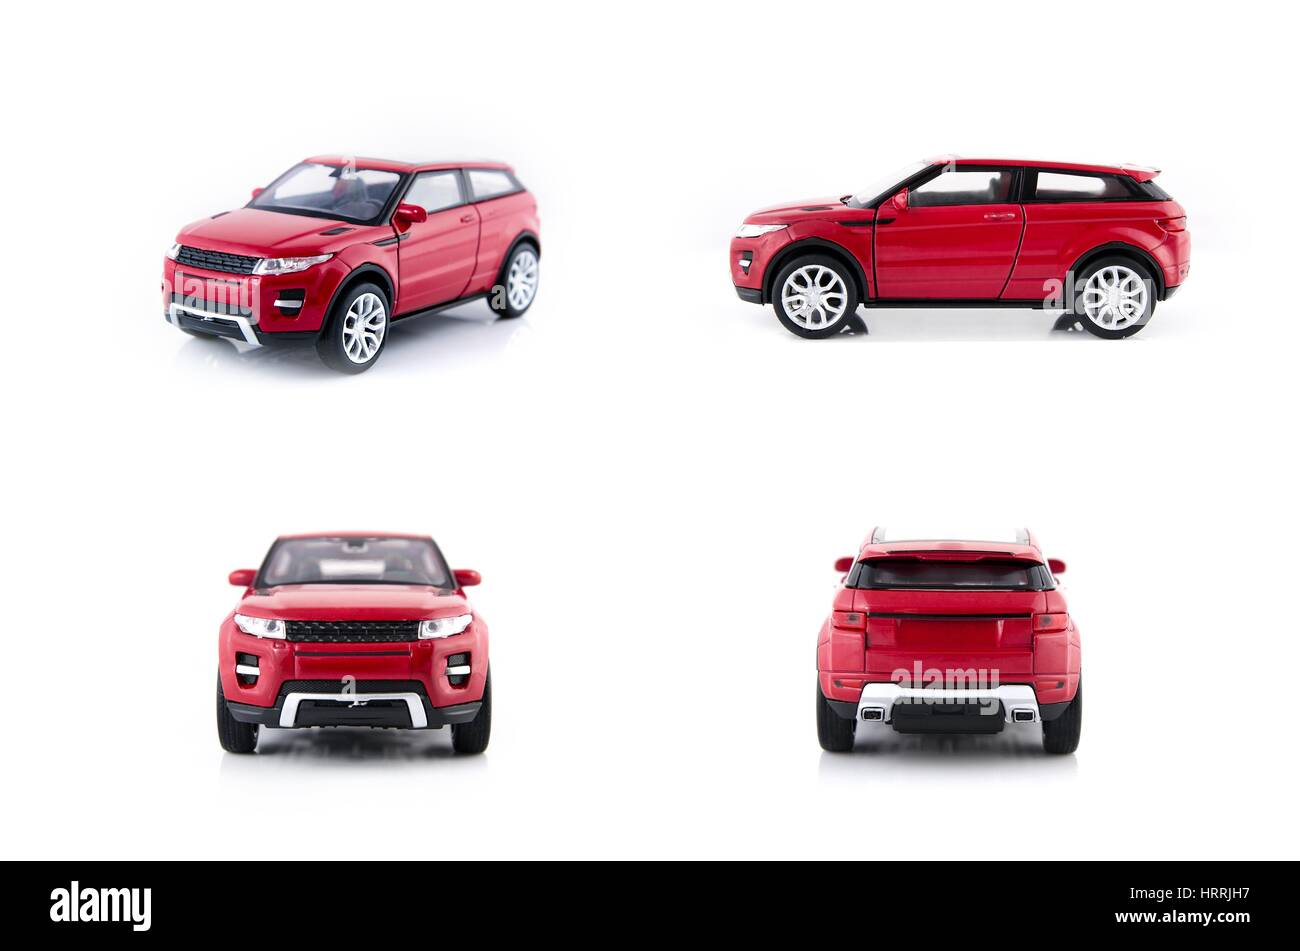 Red car toys set isolated on white background - Stock Image